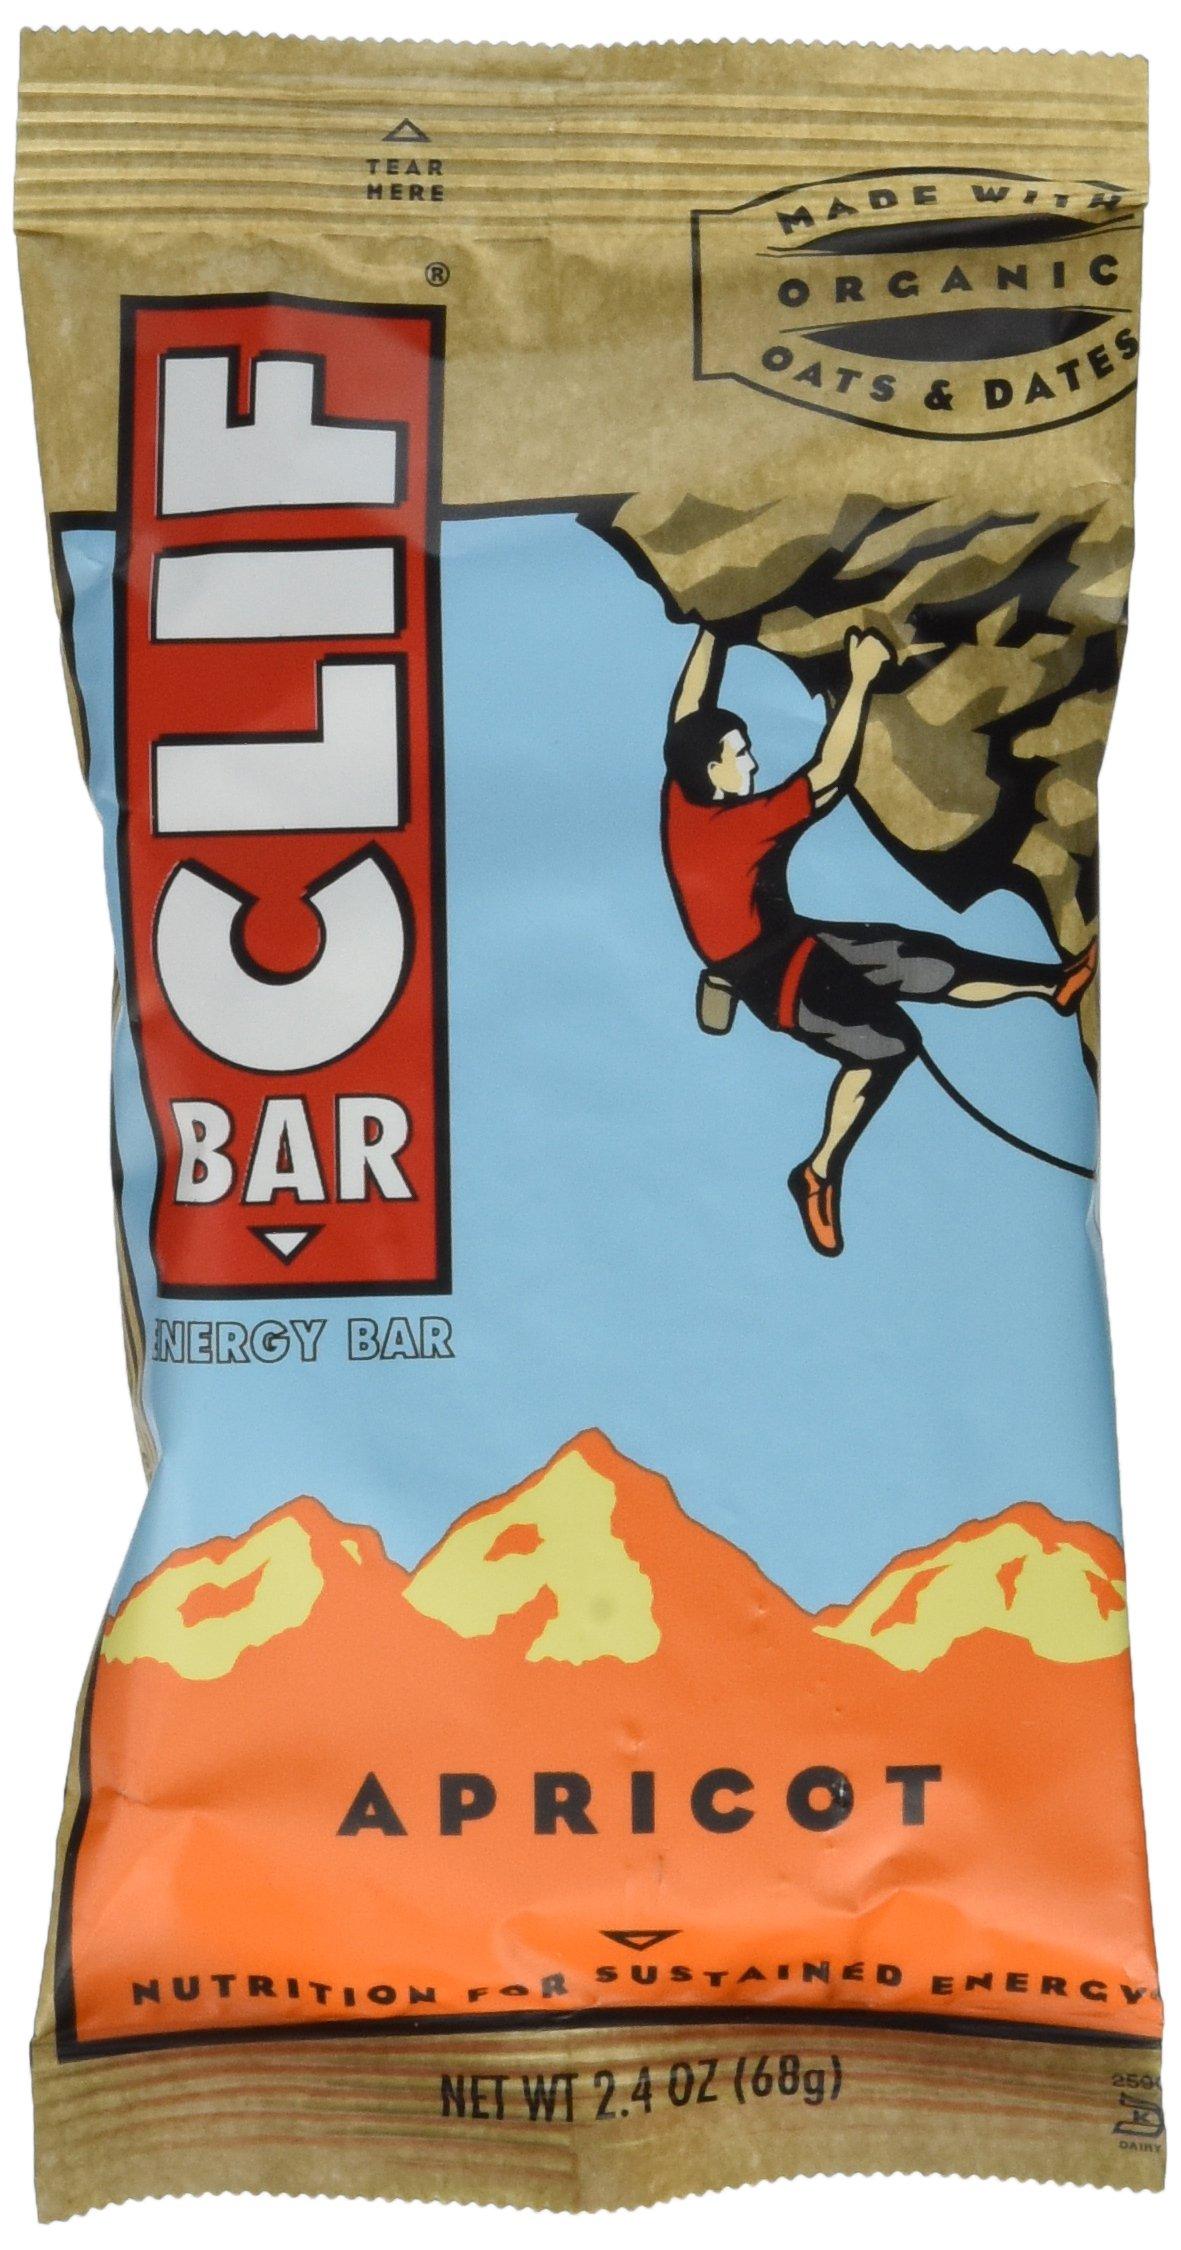 Clif Bar Energy Bar, Apricot, 2.4-Ounce Bars, 12 Count by Clif Bar